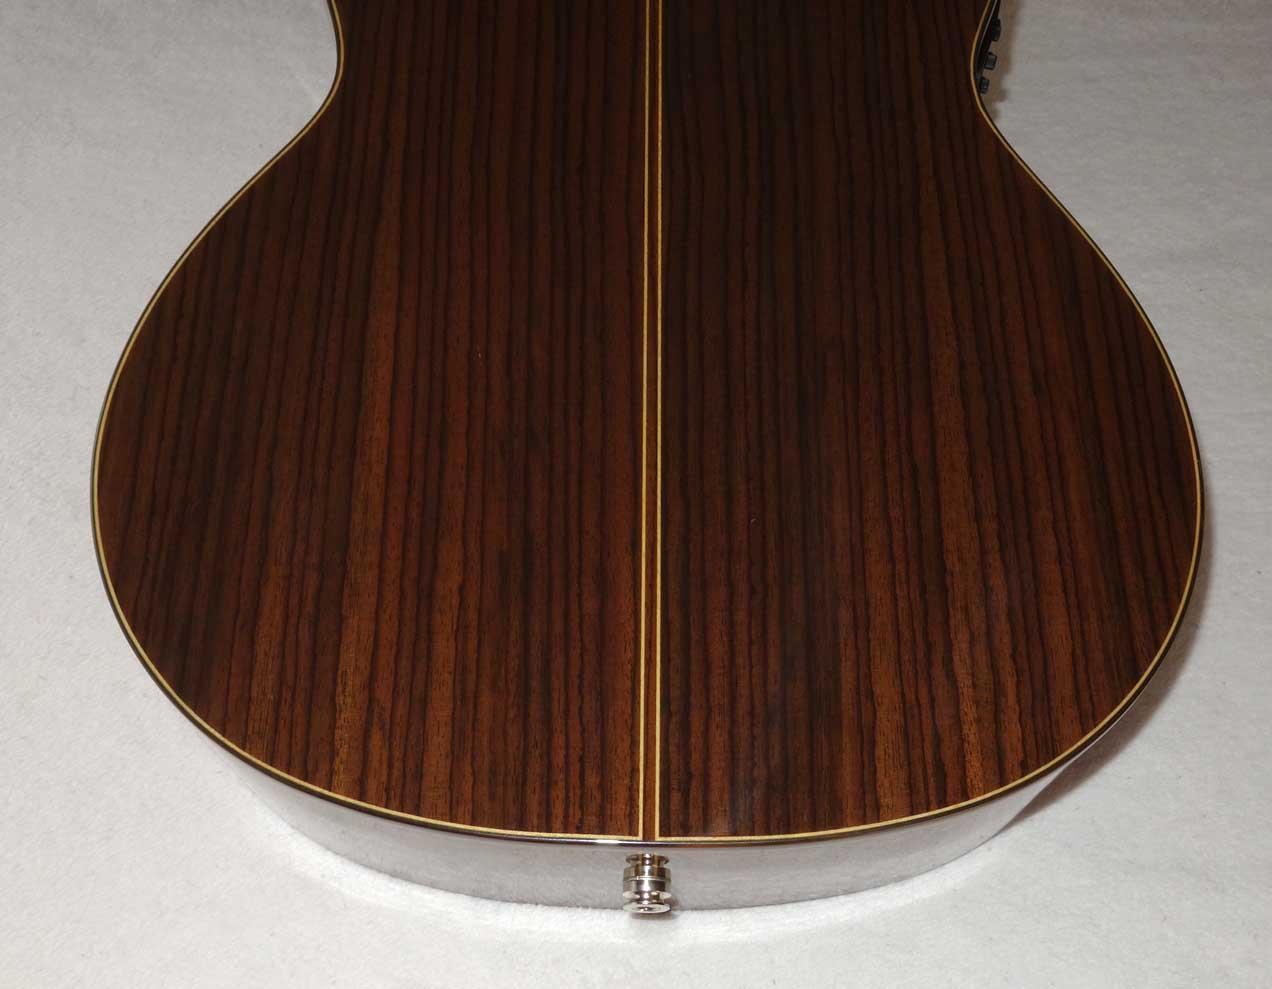 bartolex srs7cel classical 7 string harp guitar w cutaway fishman presys case ebay. Black Bedroom Furniture Sets. Home Design Ideas